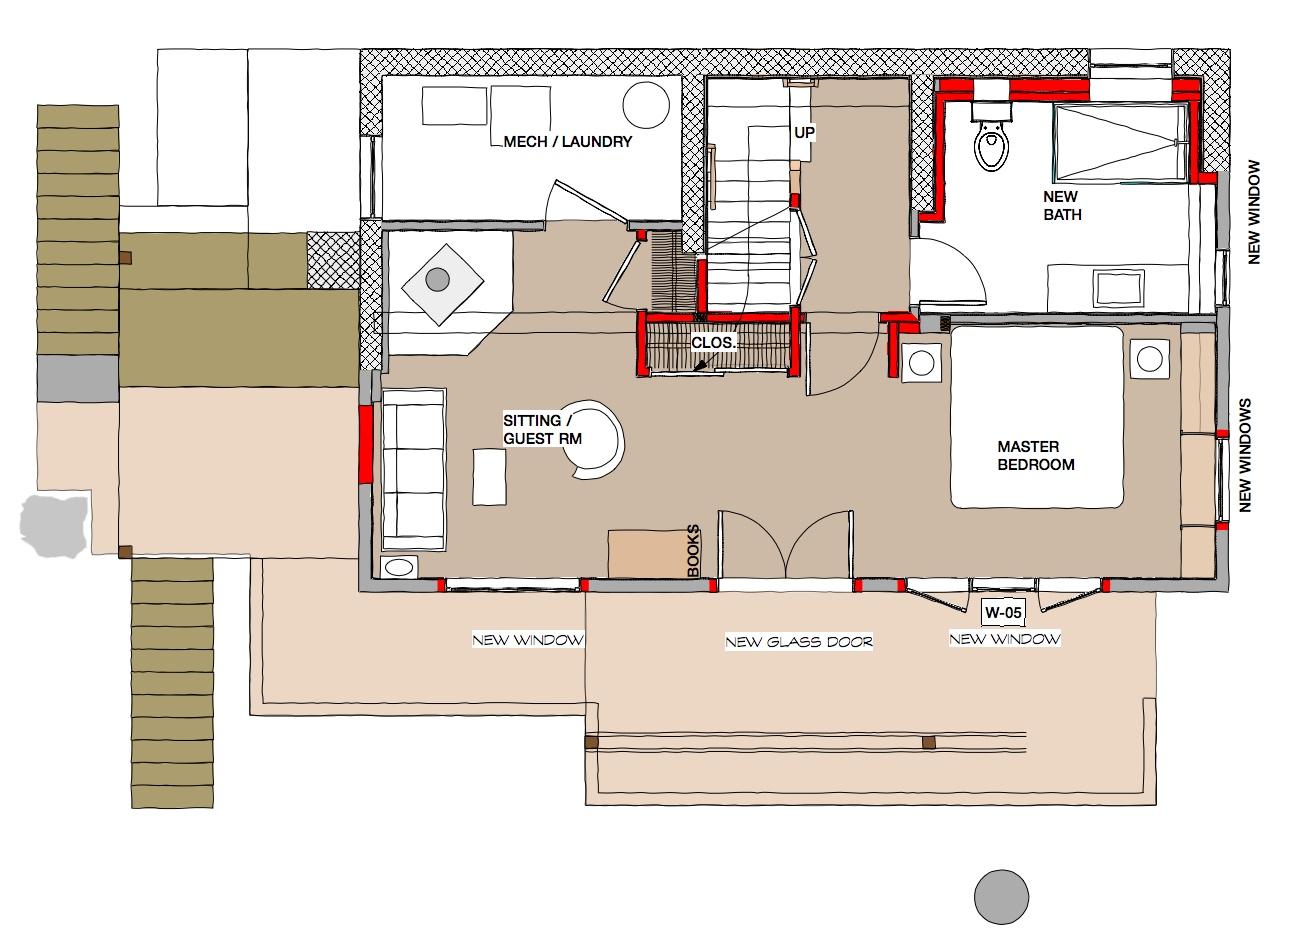 hudson river perch floor plan.jpg